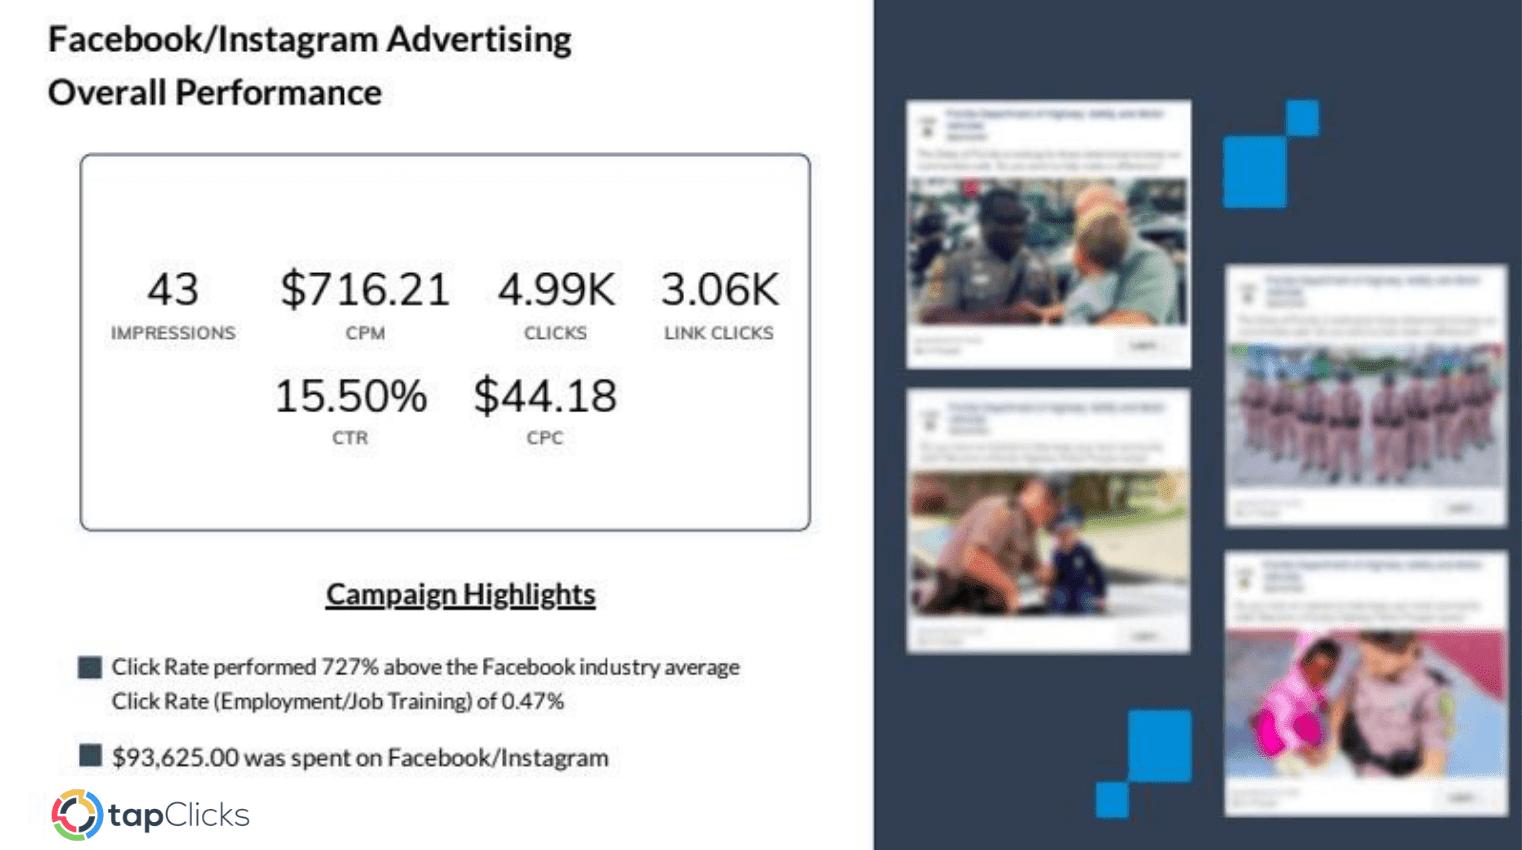 Facebook/Instagram Advertising Overall Performance